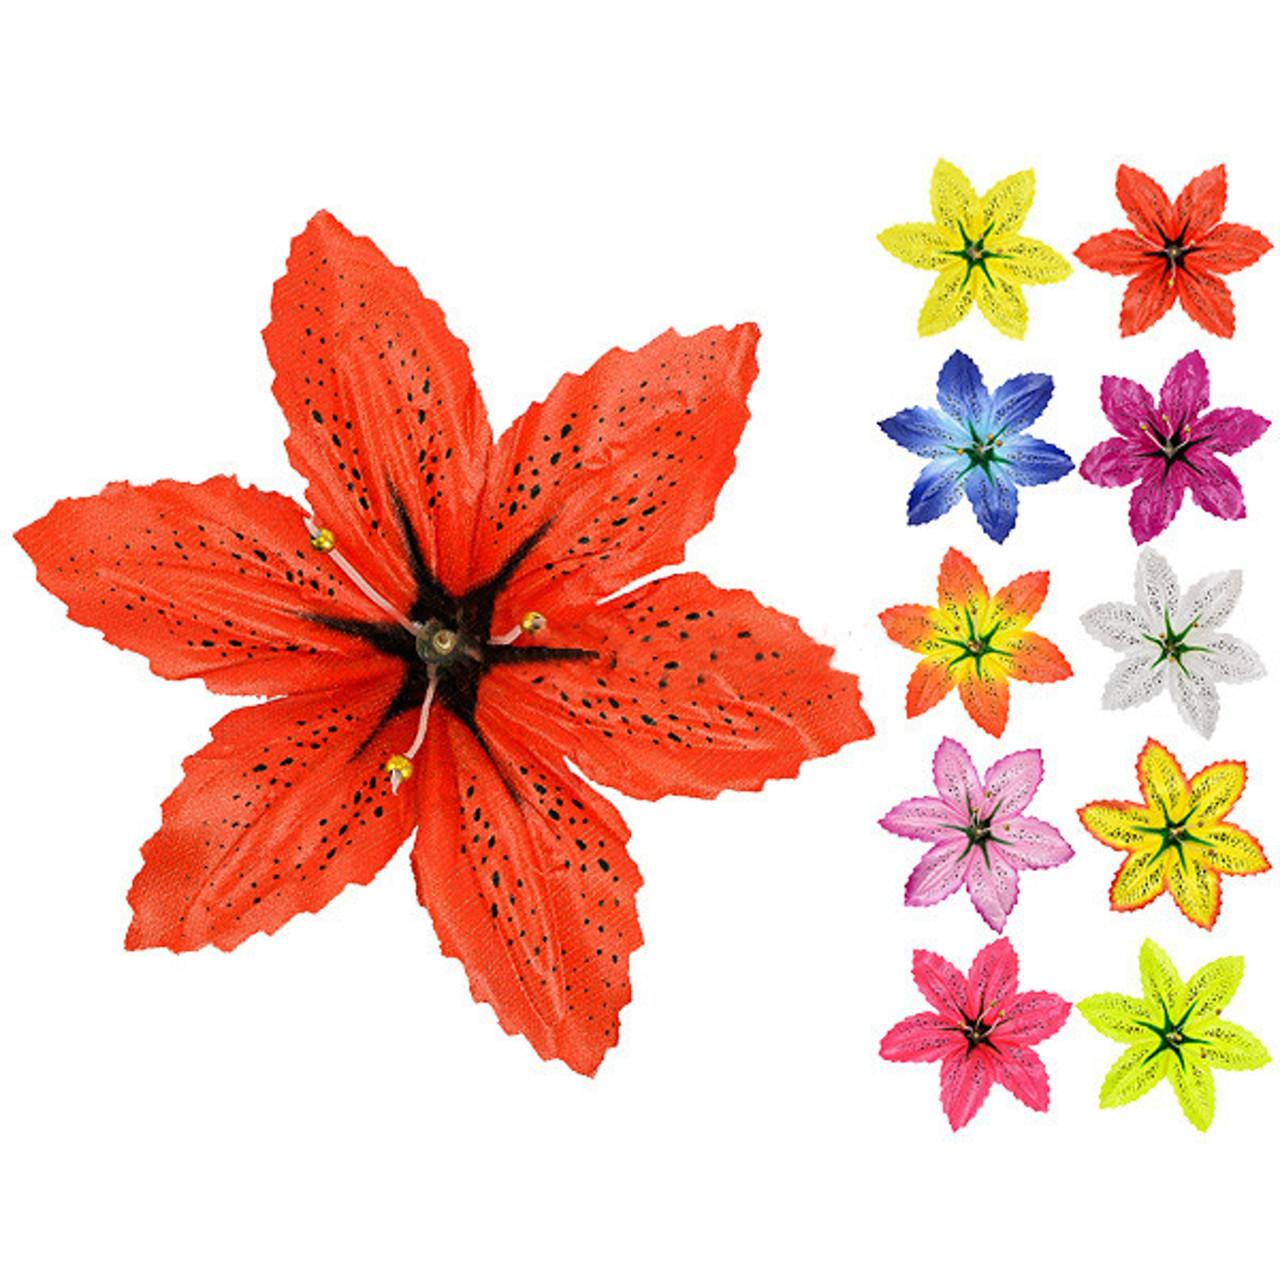 Пресс-цветок Лилия атлас пятнистая, 14см